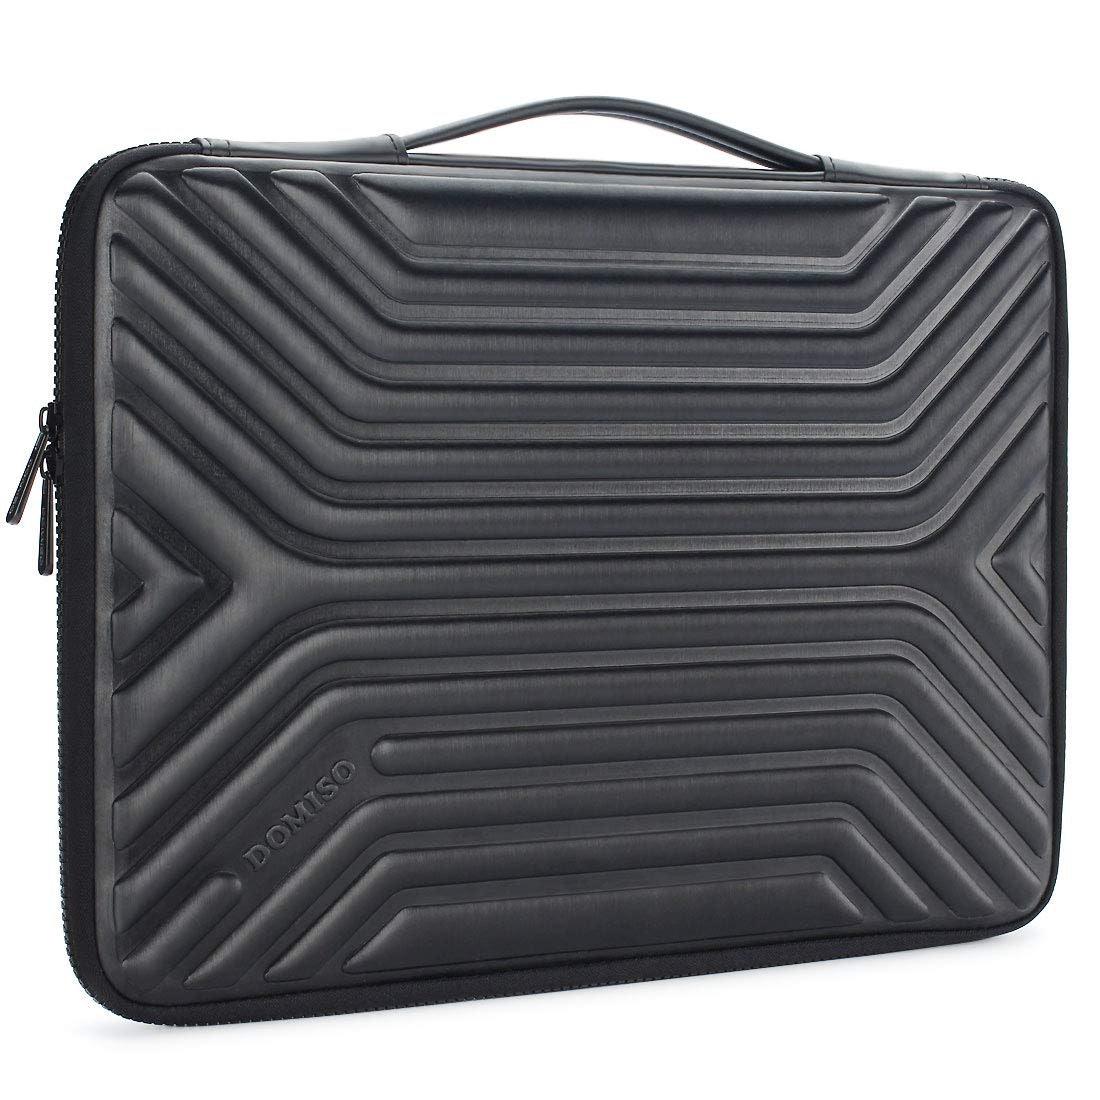 DOMISO 15.6 Inch Shockproof Waterproof Laptop Sleeve with Handle